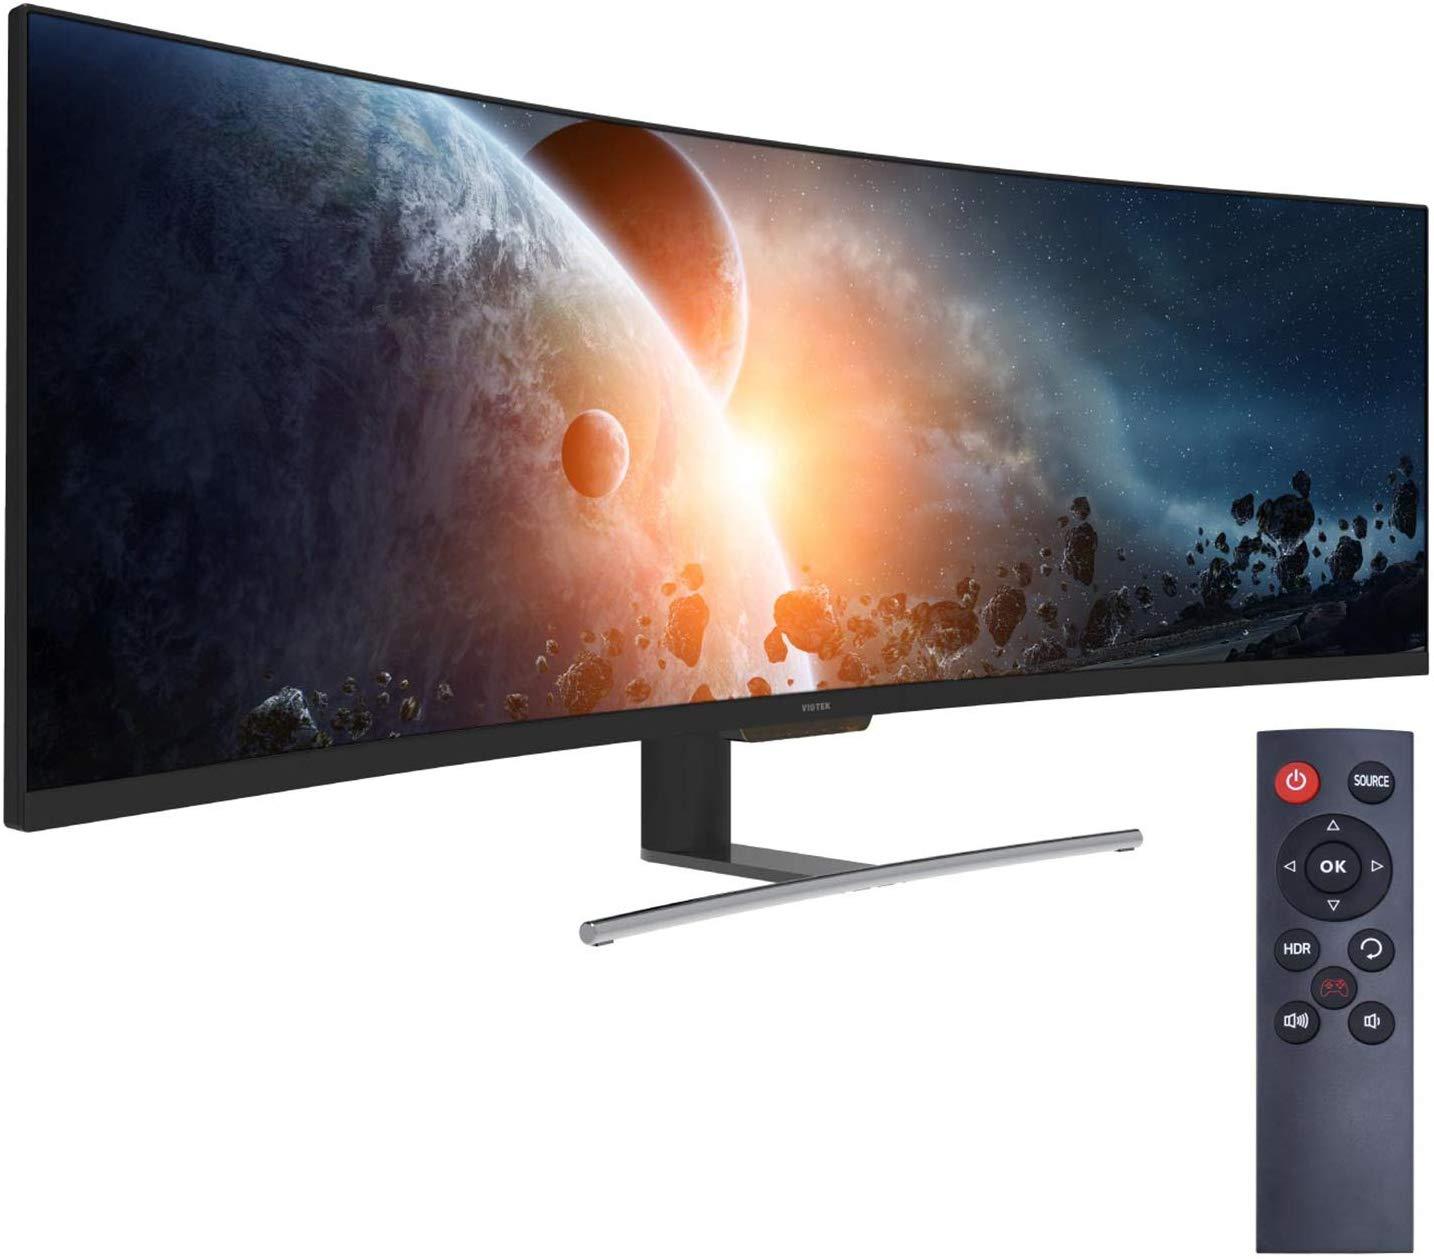 Best 49-inch Super Ultrawide Monitors (Reviewed December 2019) 13